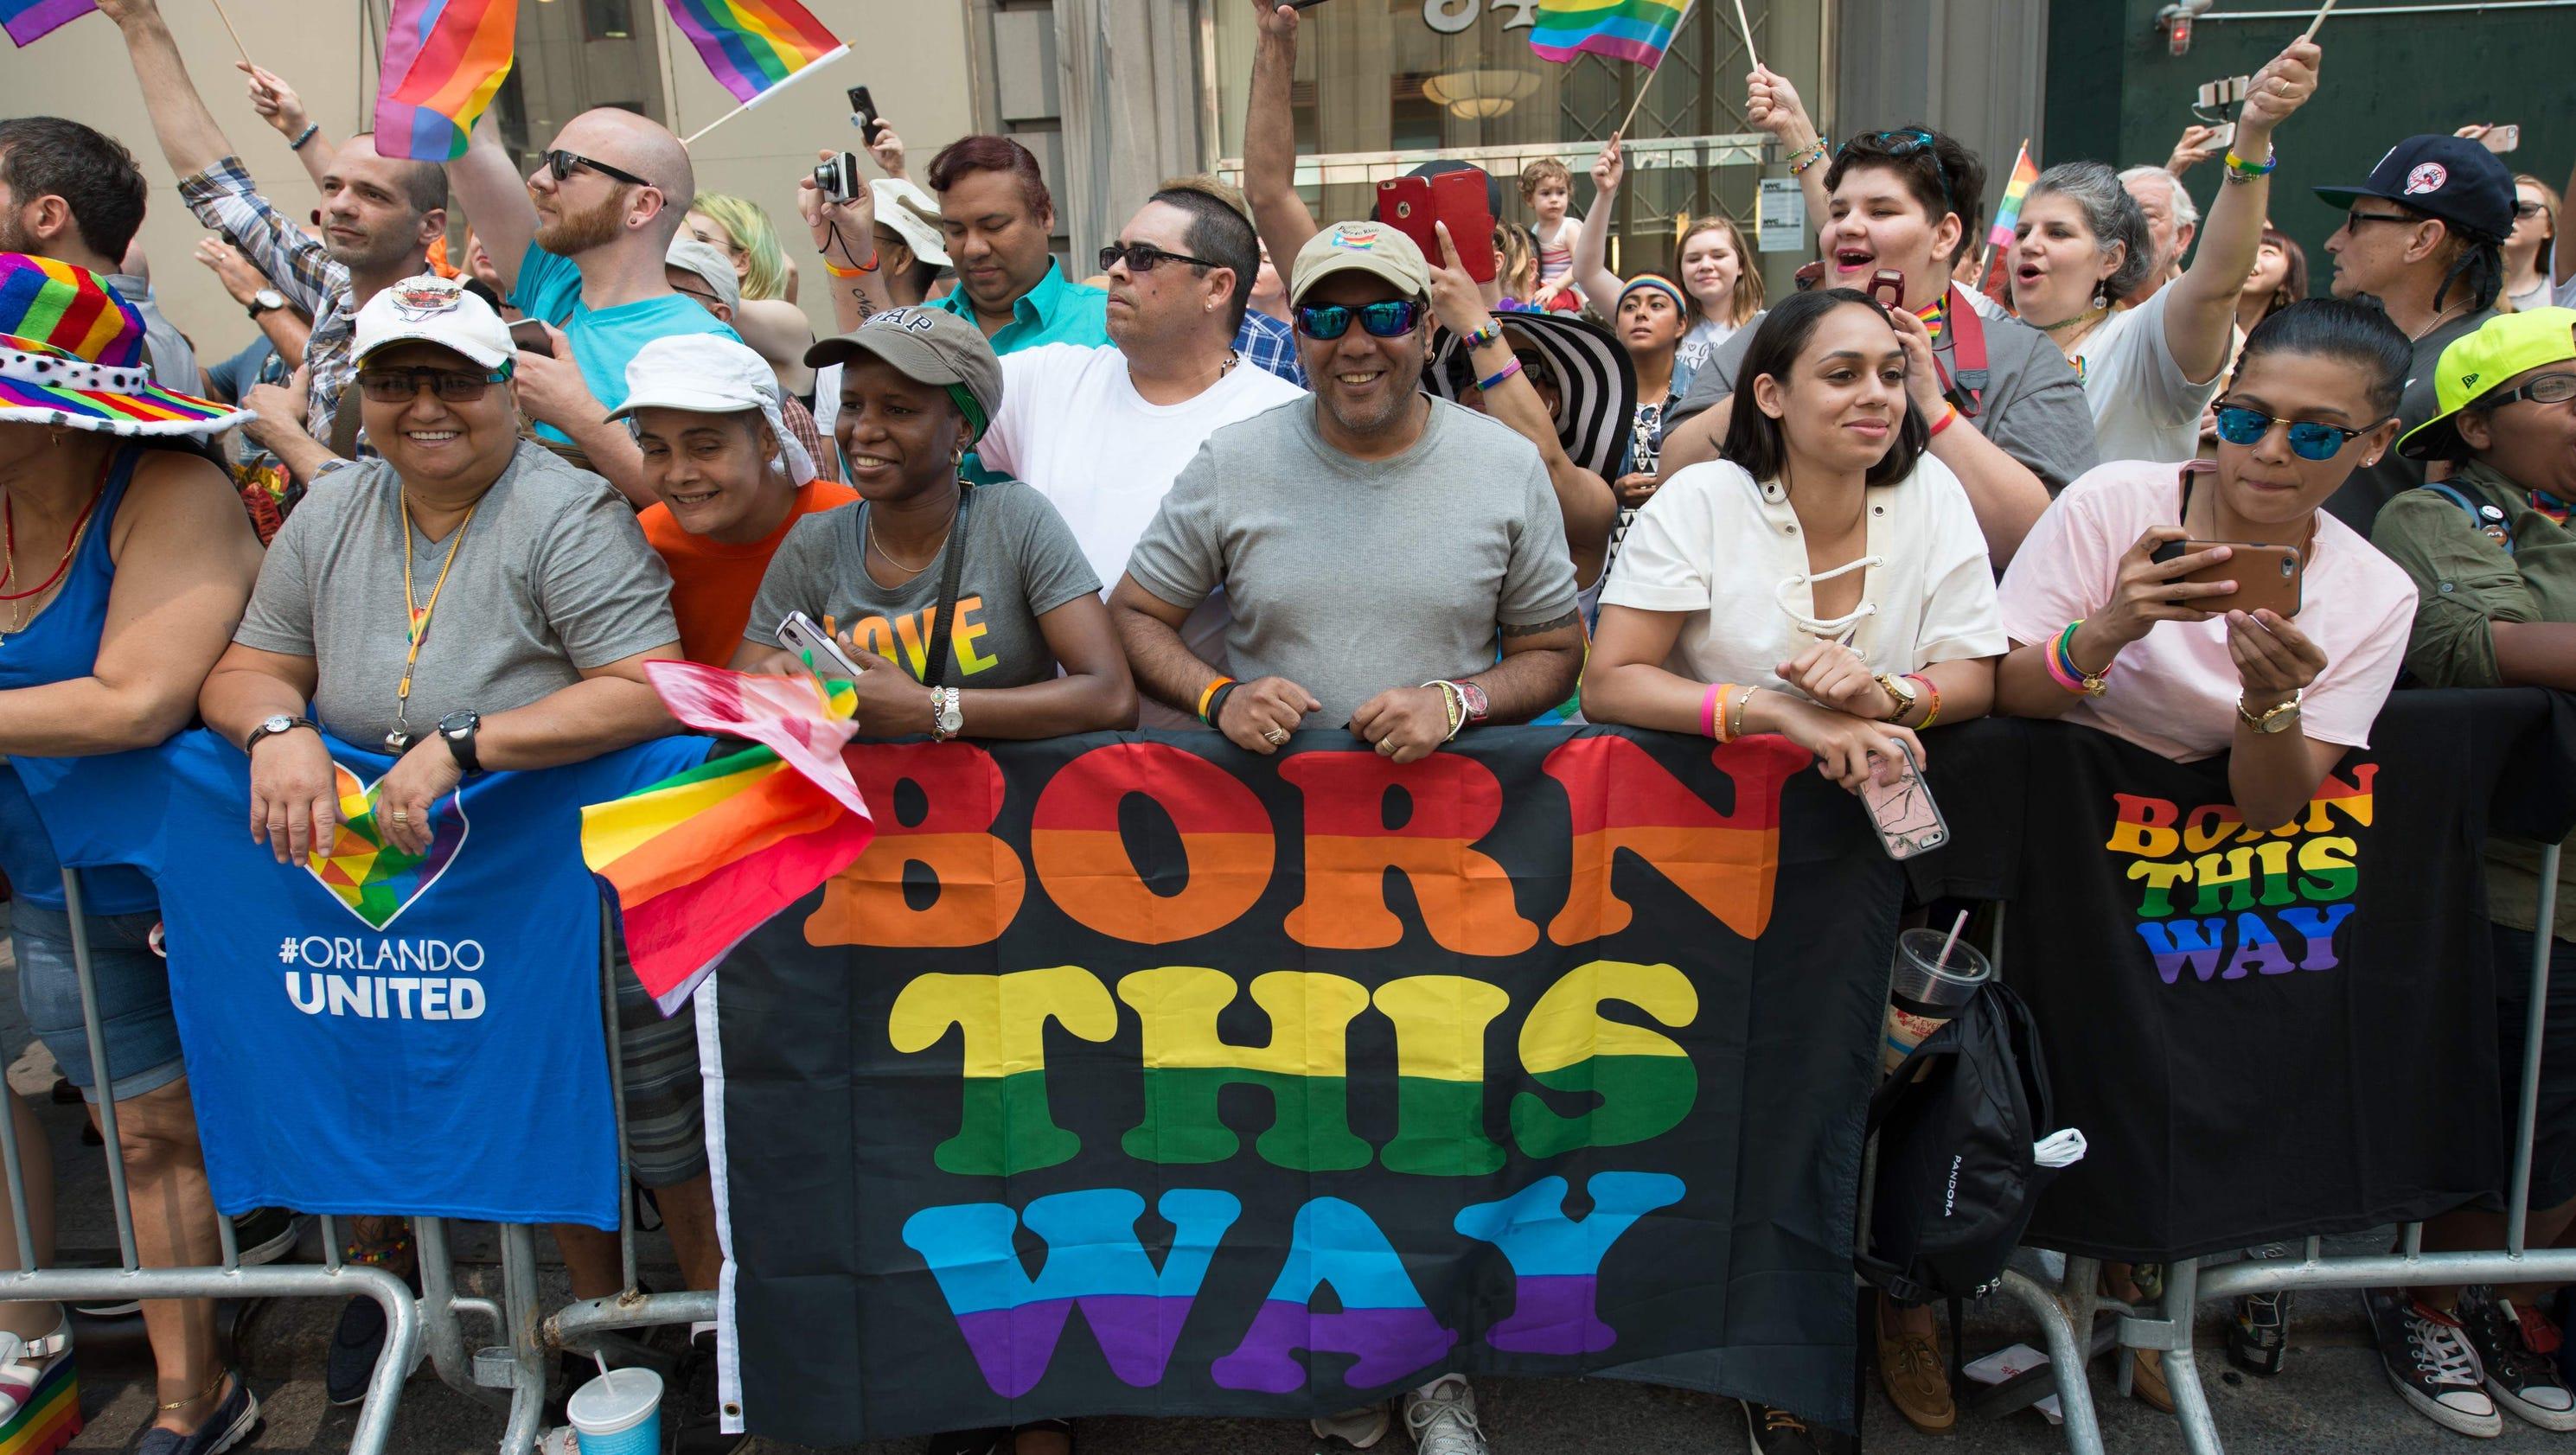 the gay community in so many ways